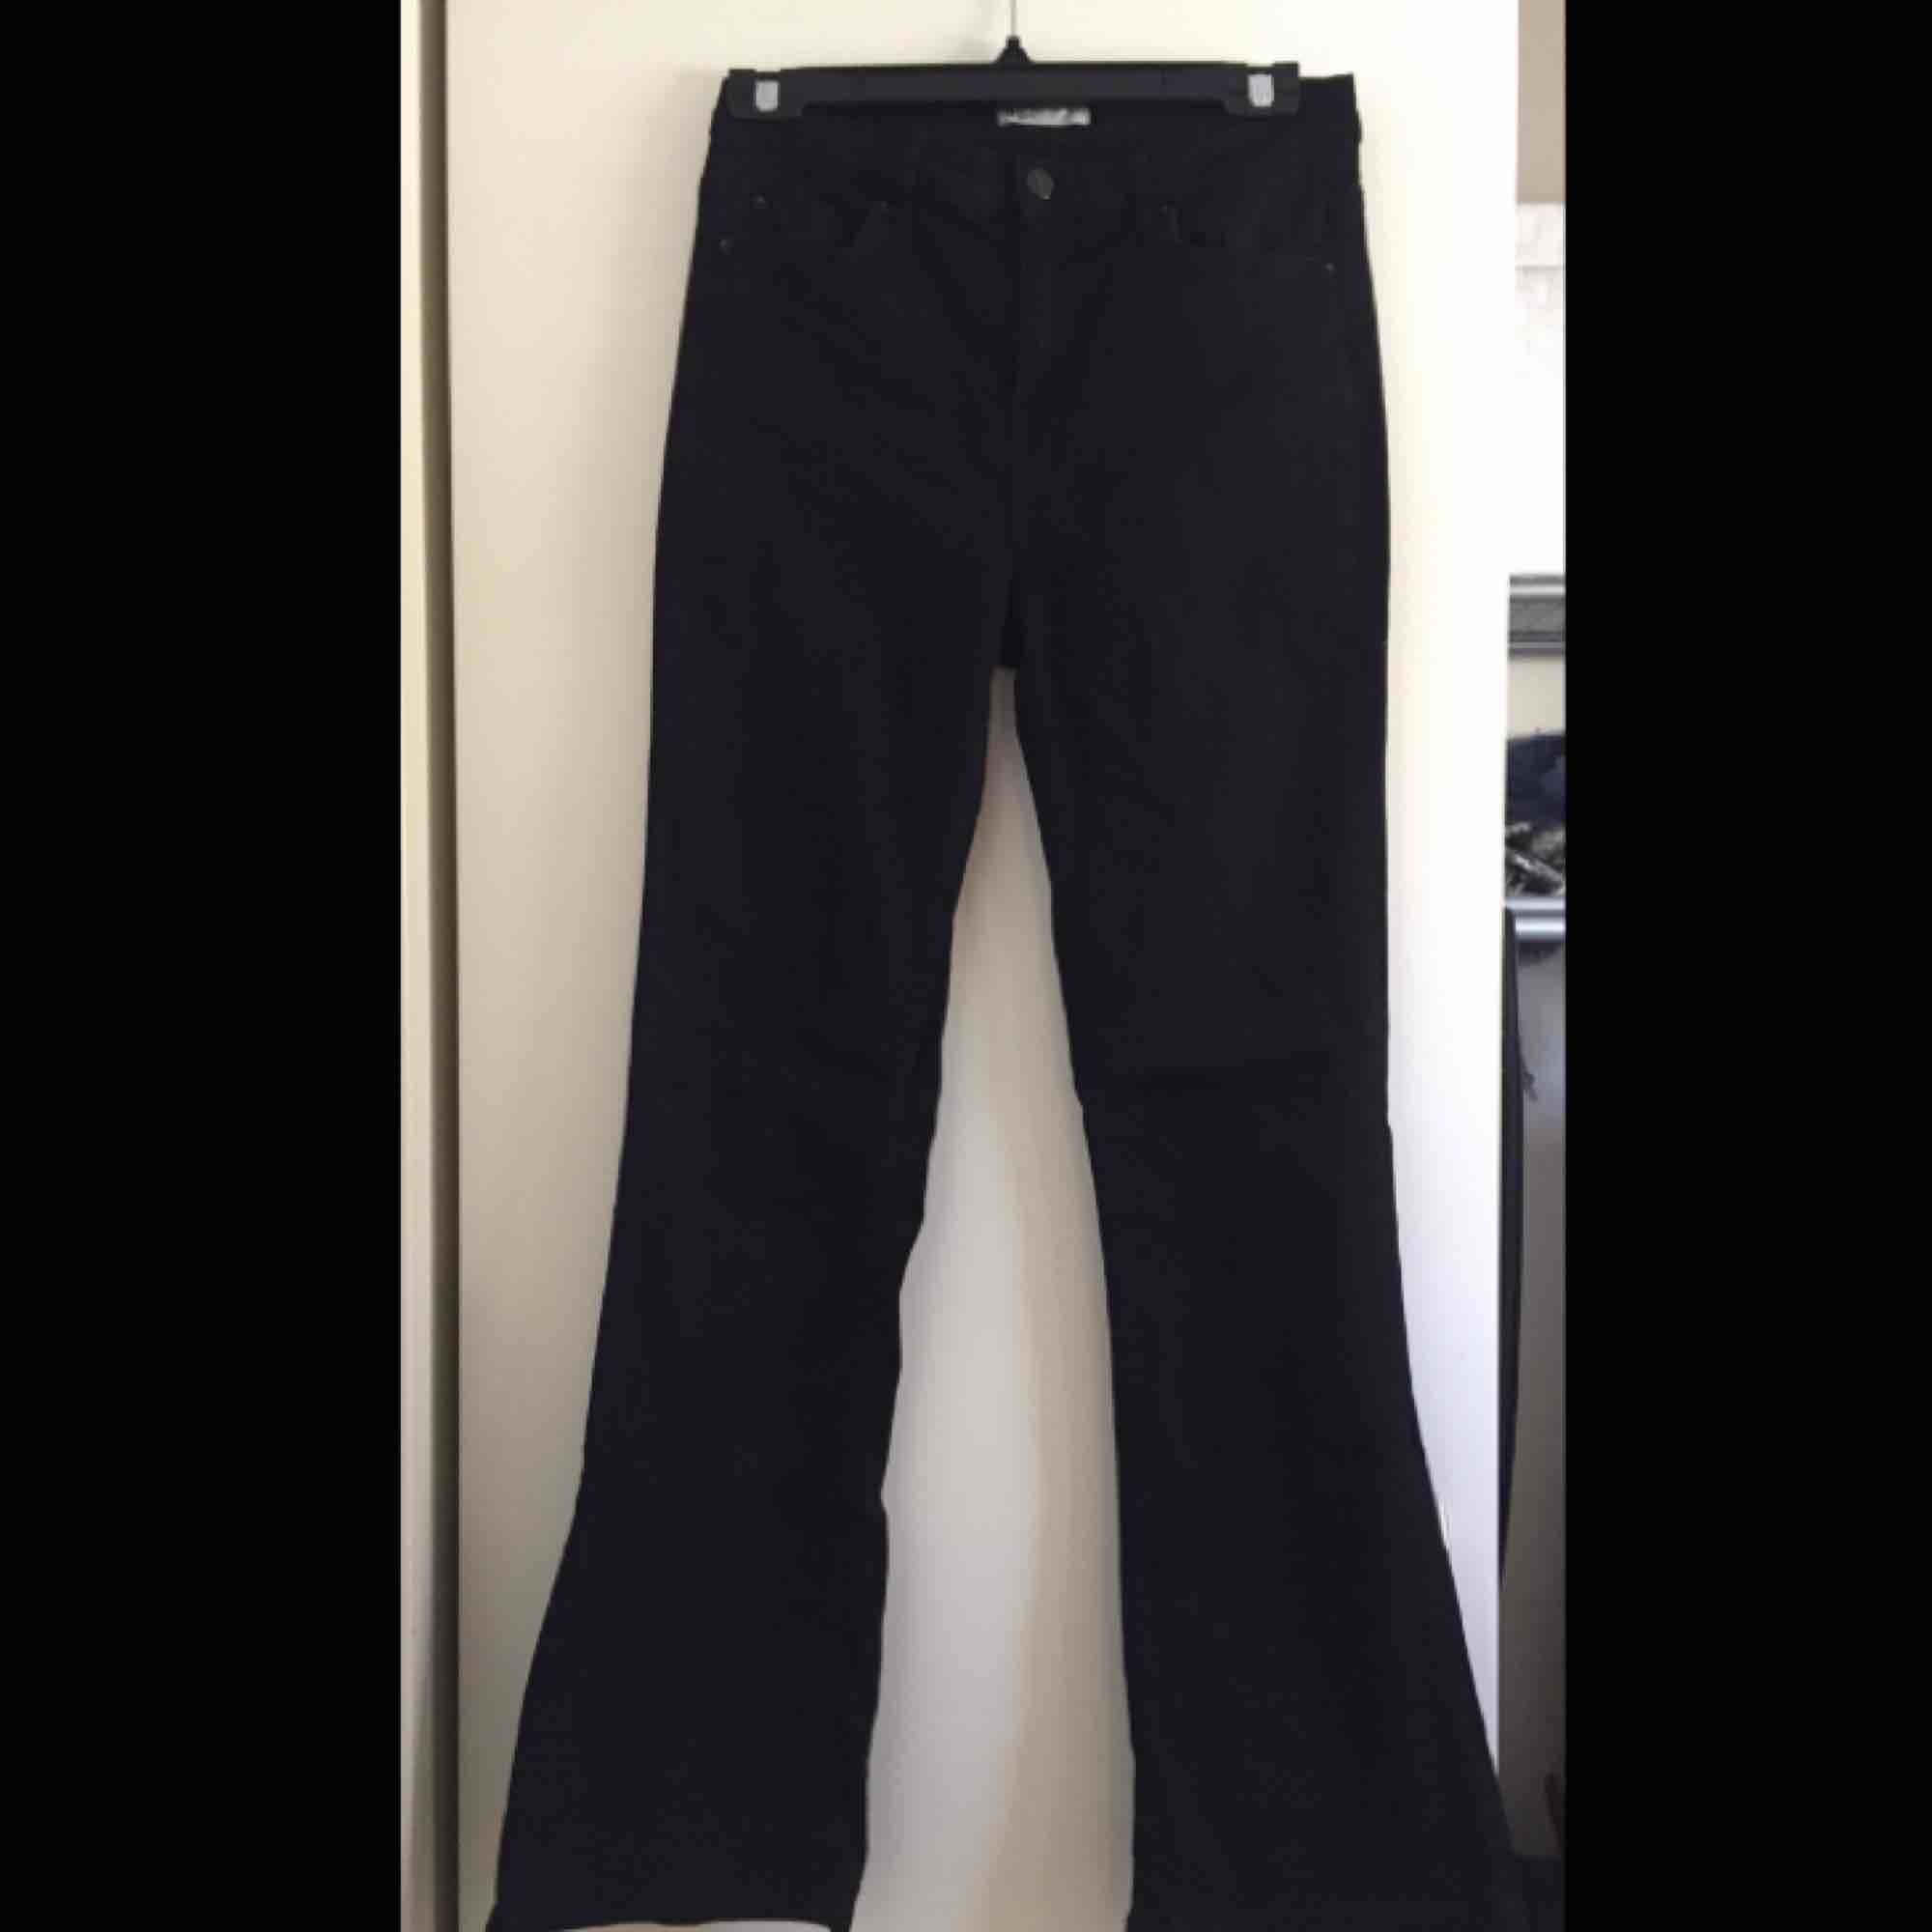 Svarta bootcut/flare jeans från GinaTricot i strl M. 📬 Frakt: 63 kr spårbart. Jeans & Byxor.